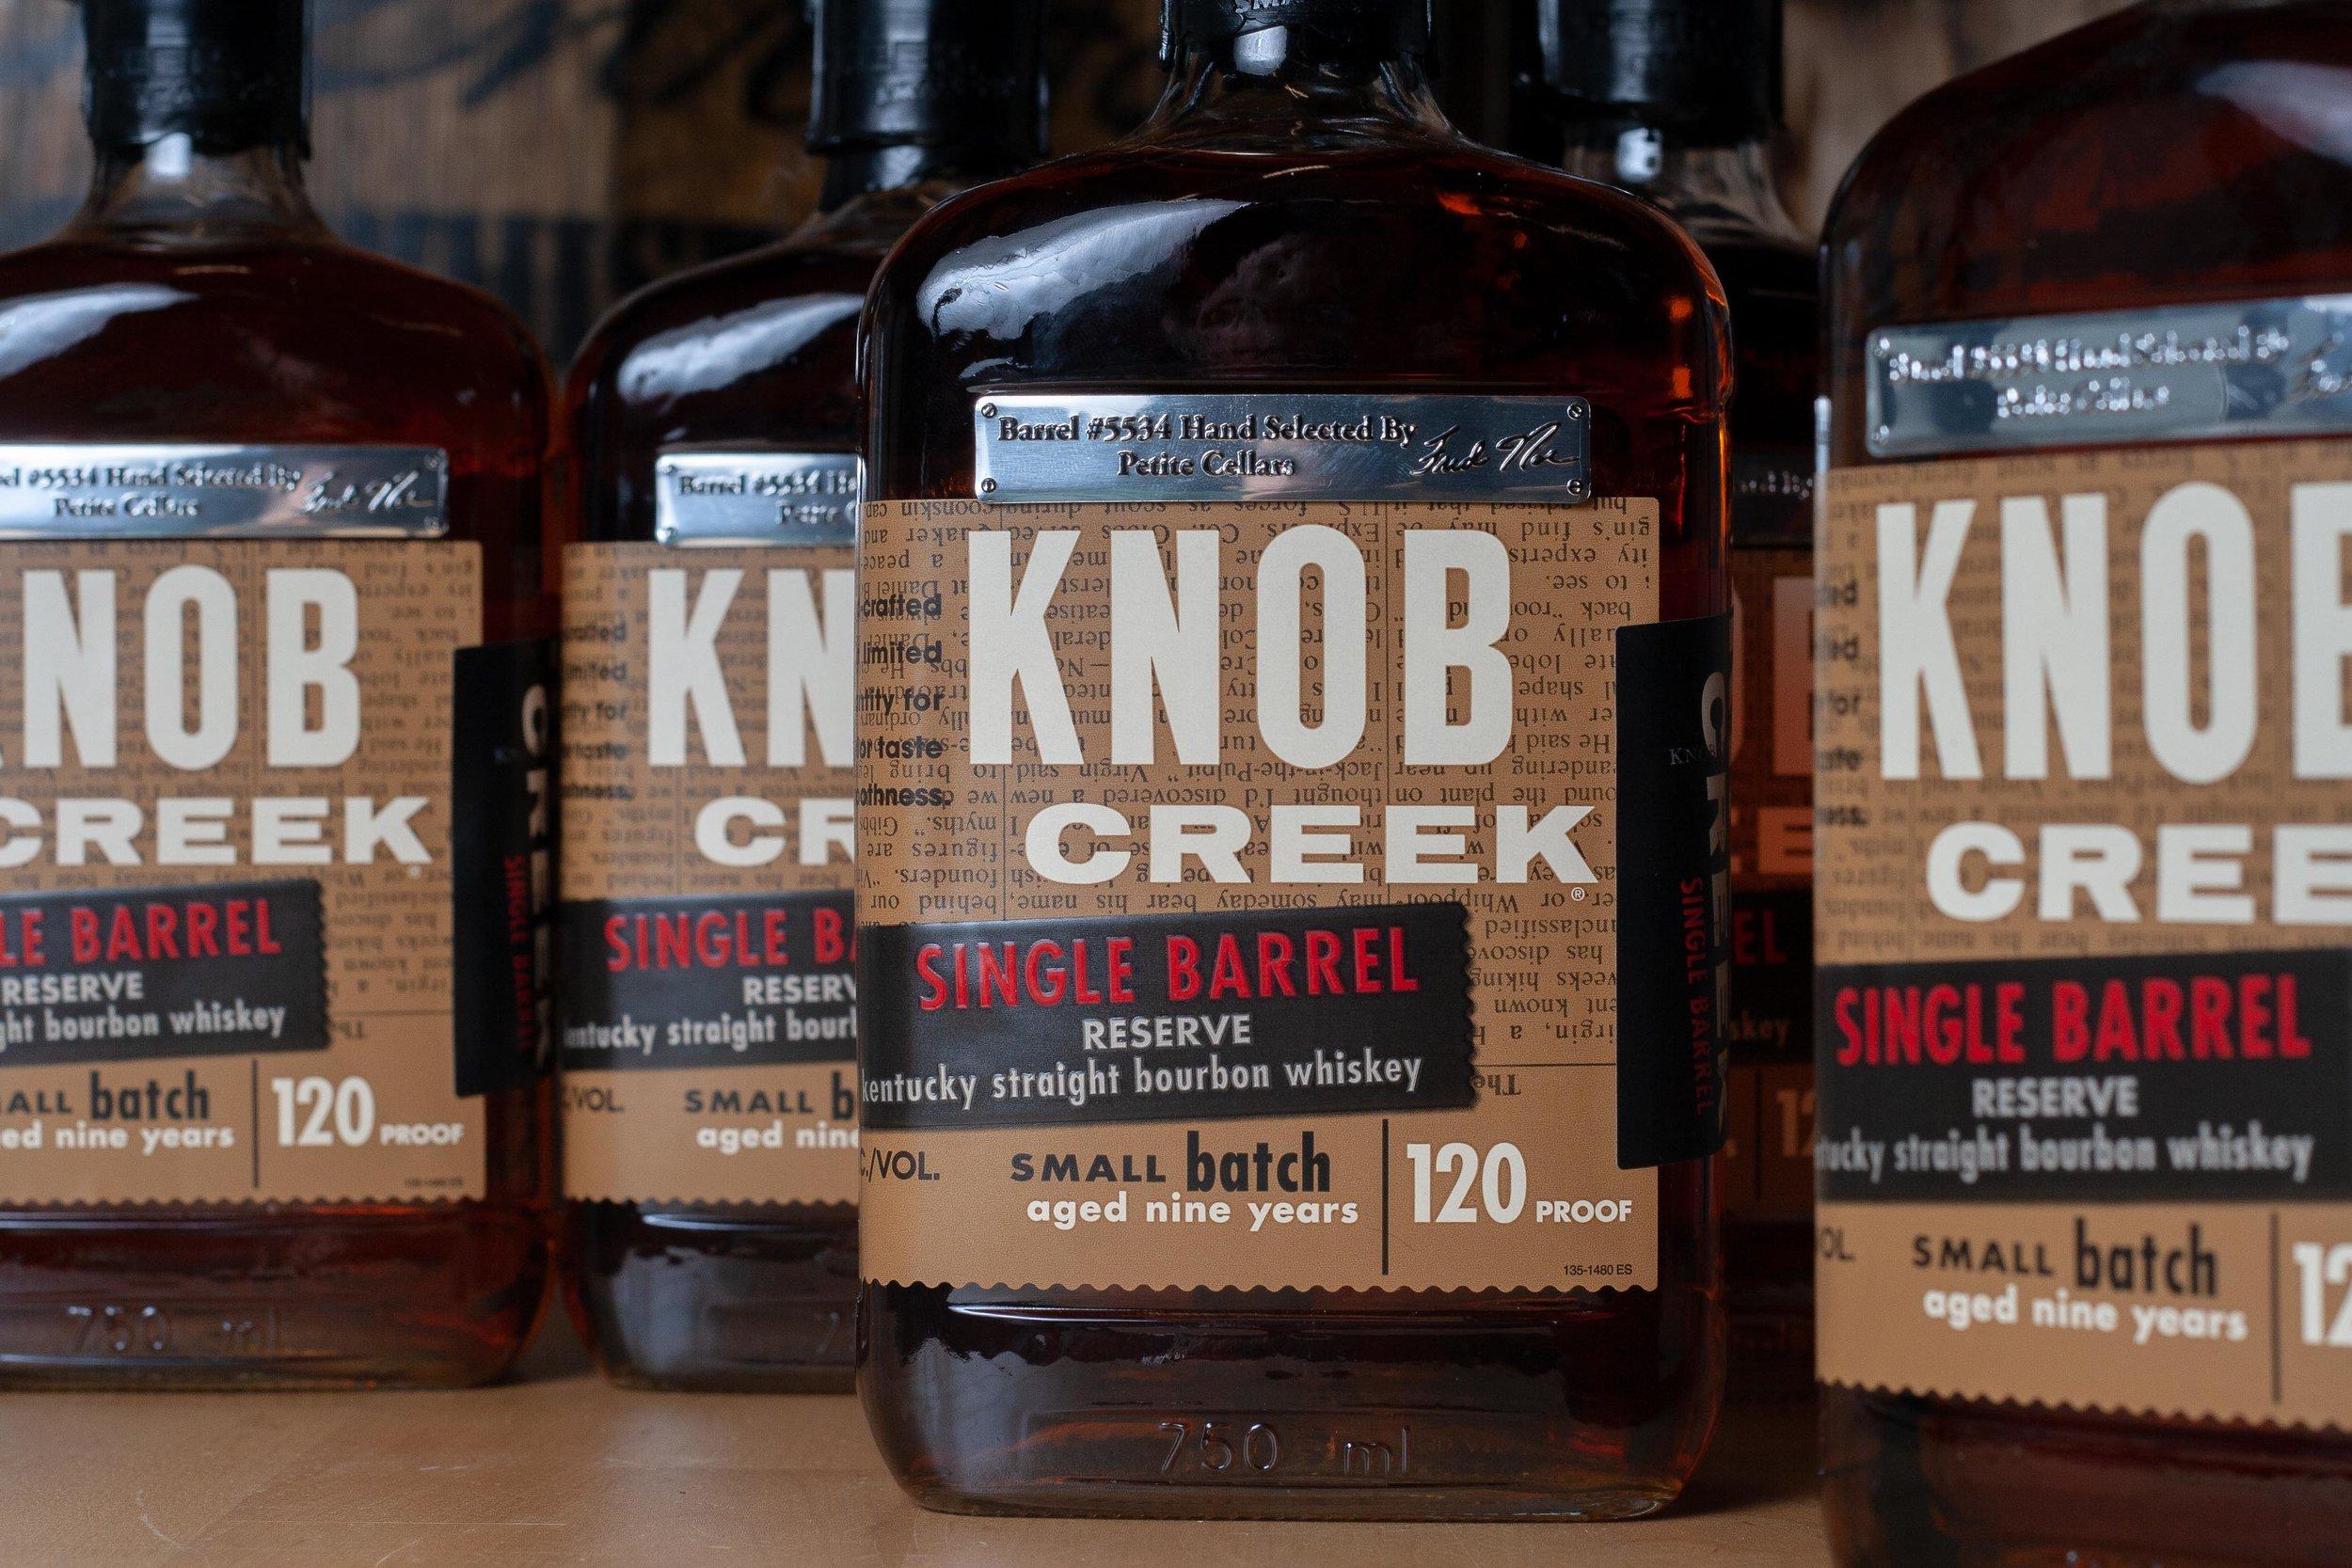 knob-creek-barrel-release.jpg